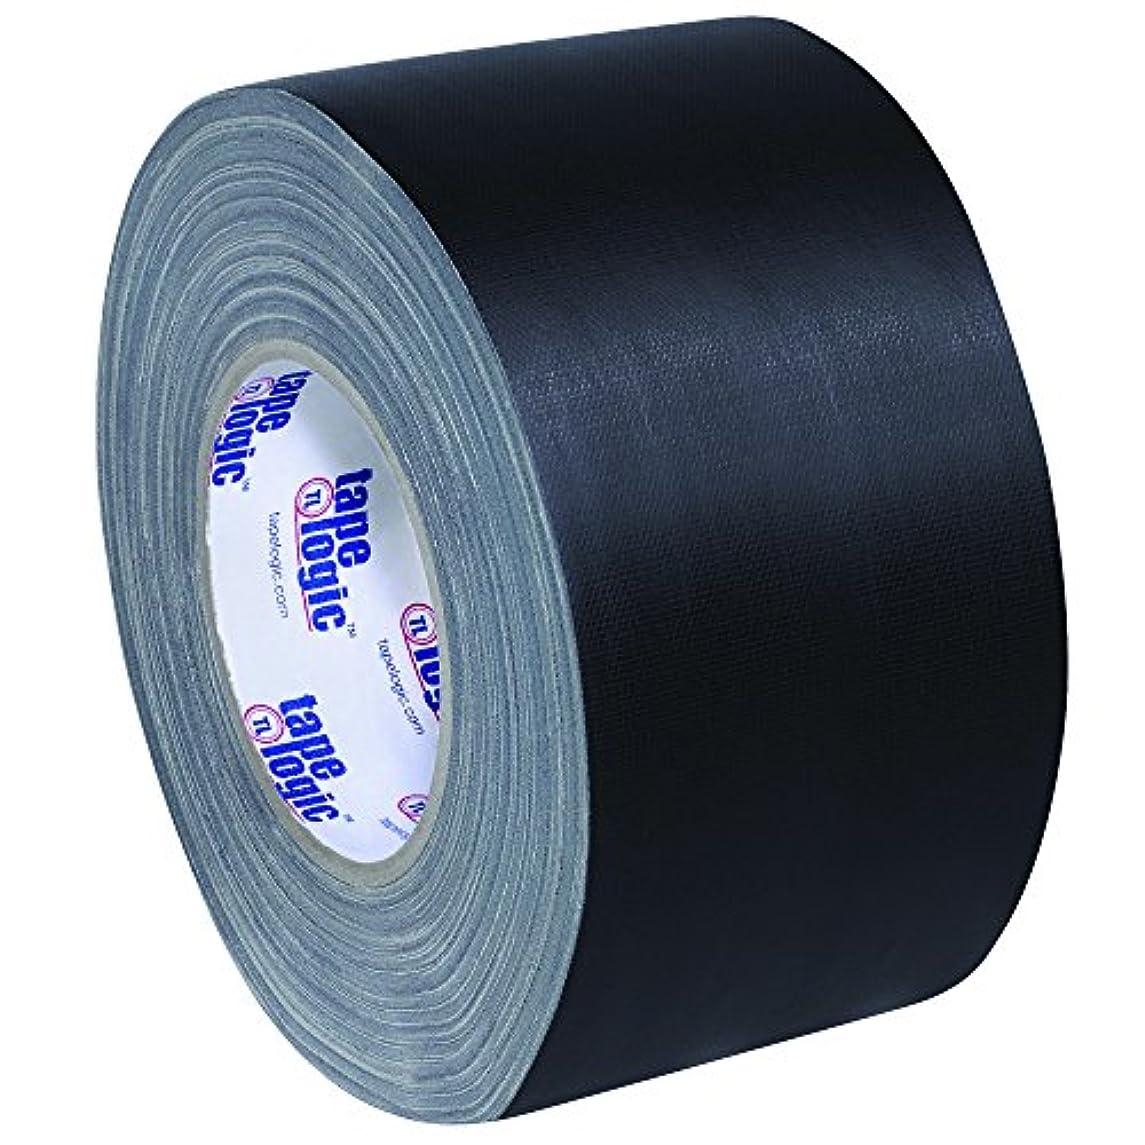 Tape Logic TLT98818B3PK Gaffers Tape, 11.0 Mil, 3